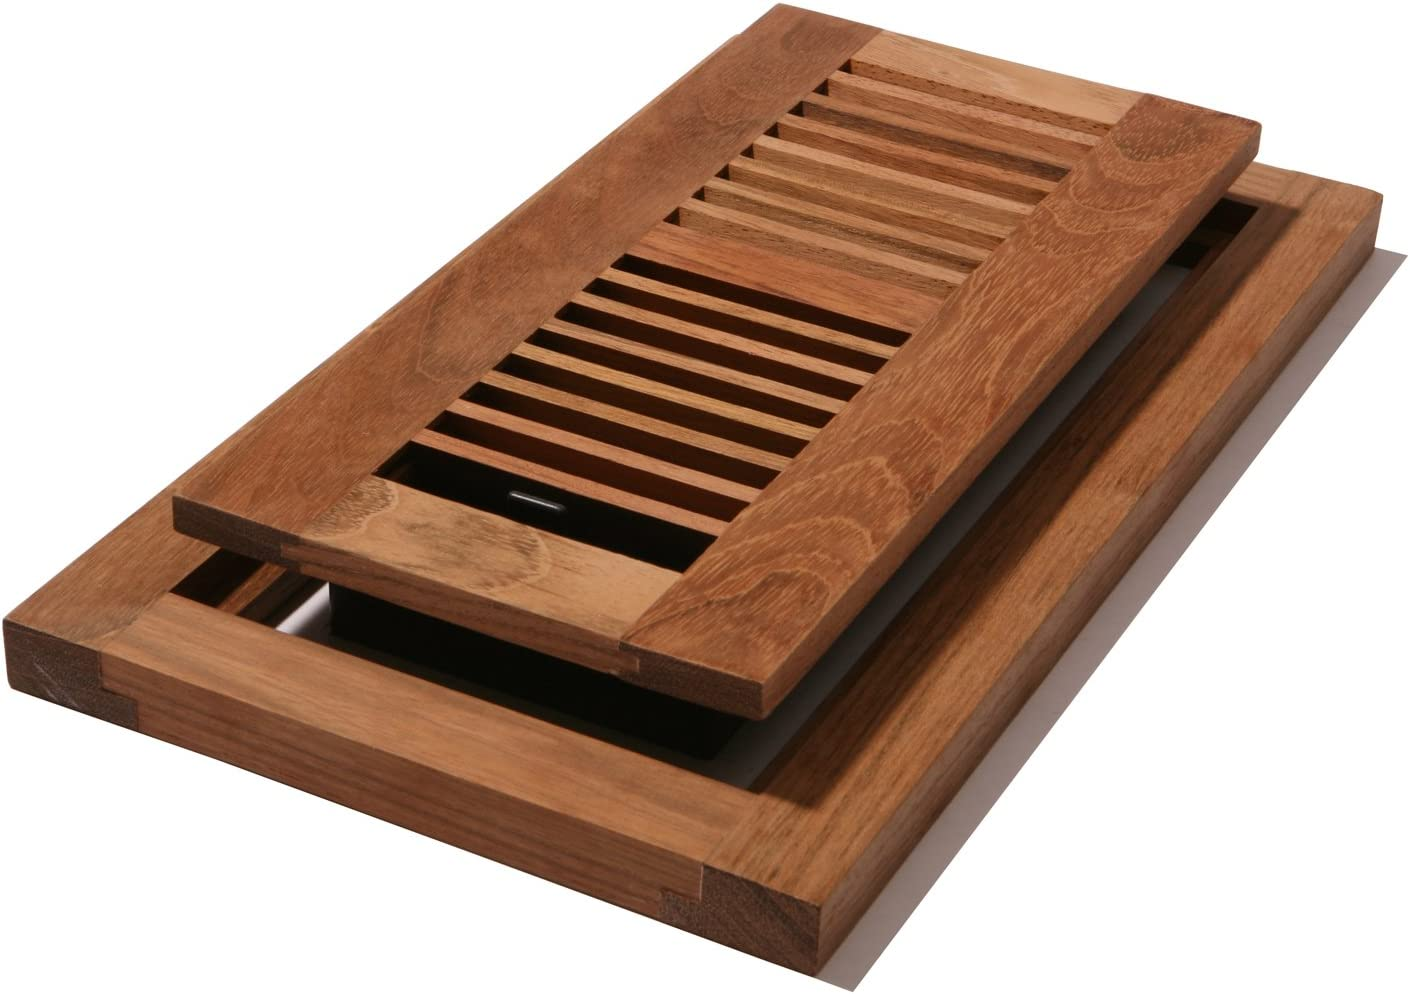 Unfinished Maple Decor Grates WMLF412-U 4-Inch by 12-Inch Wood Flushmount Floor Register